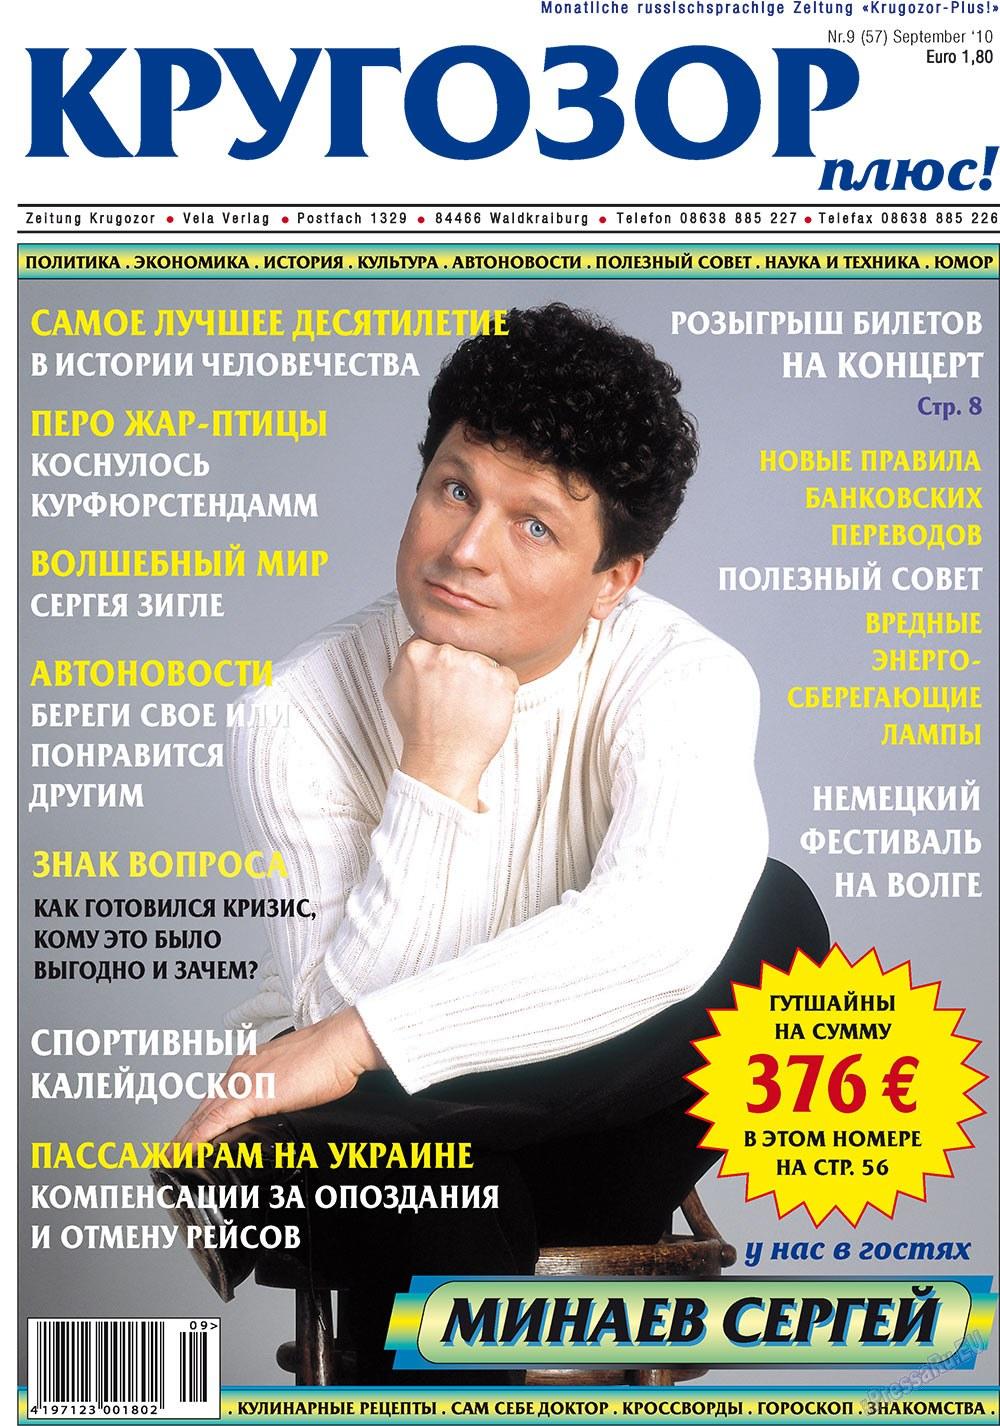 Кругозор плюс! (газета). 2010 год, номер 9, стр. 1